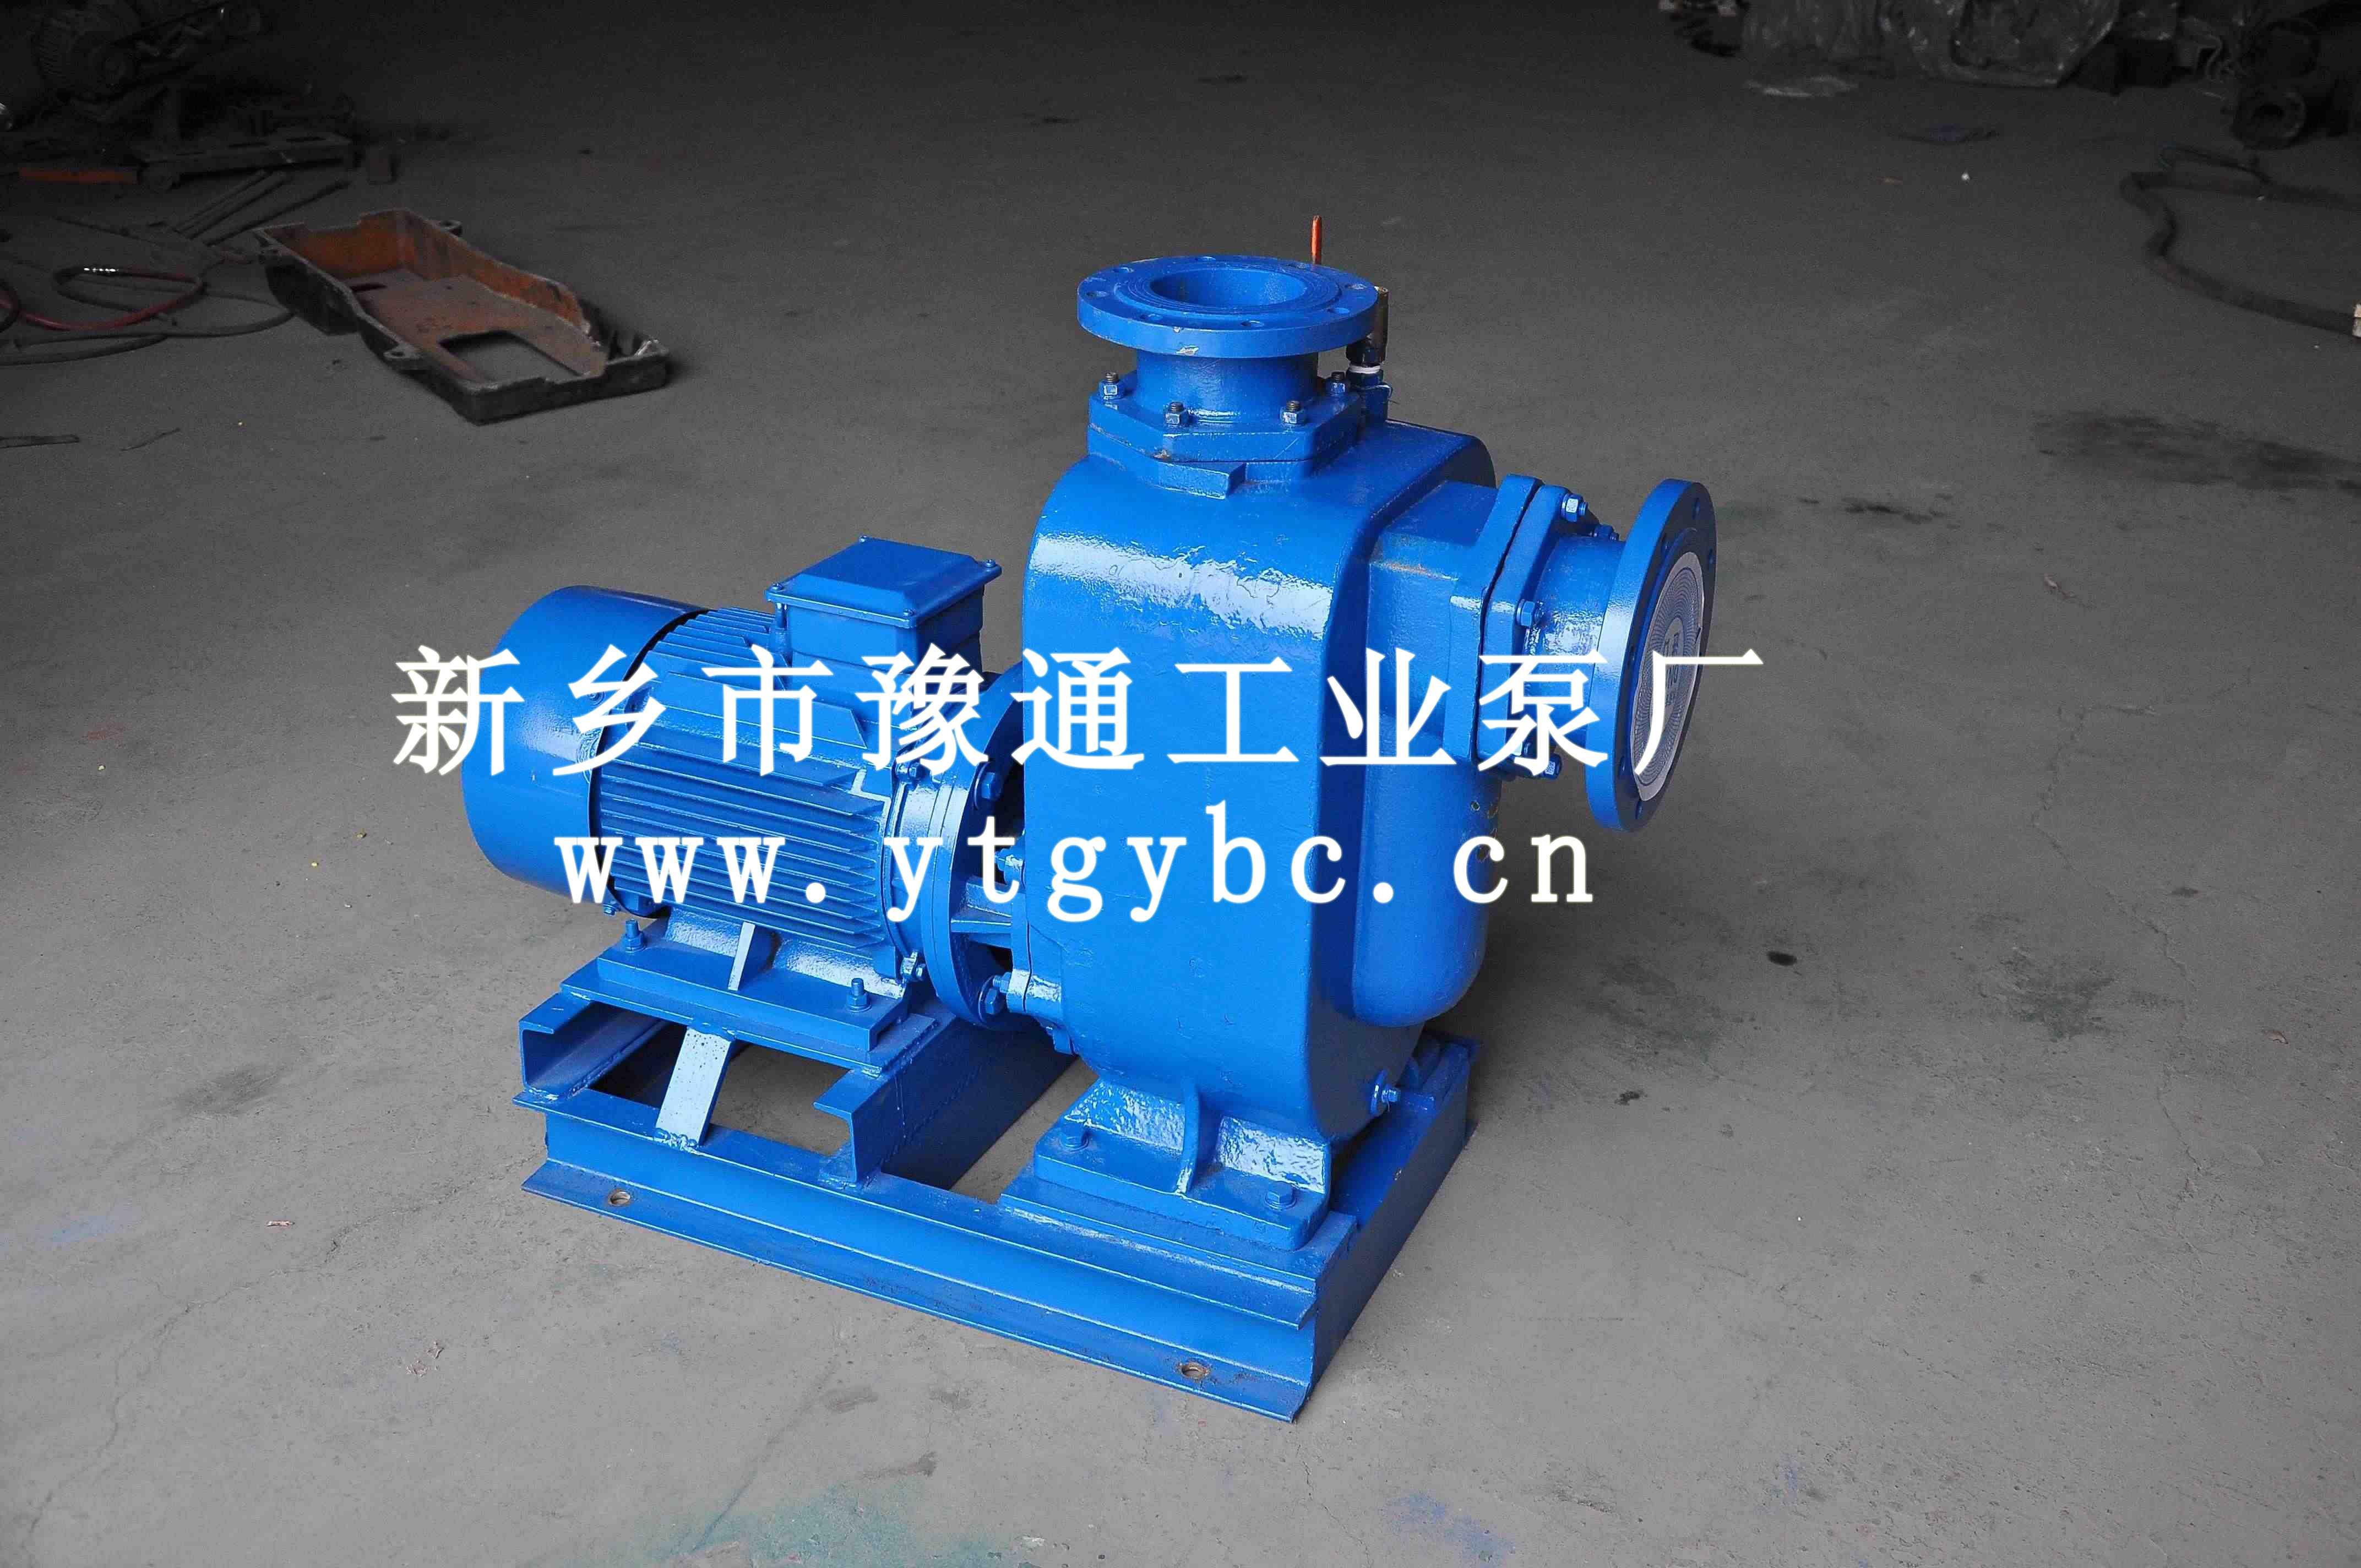 ZW自吸式排污泵生产厂家:质量好的ZW自吸式无堵塞排污泵推荐